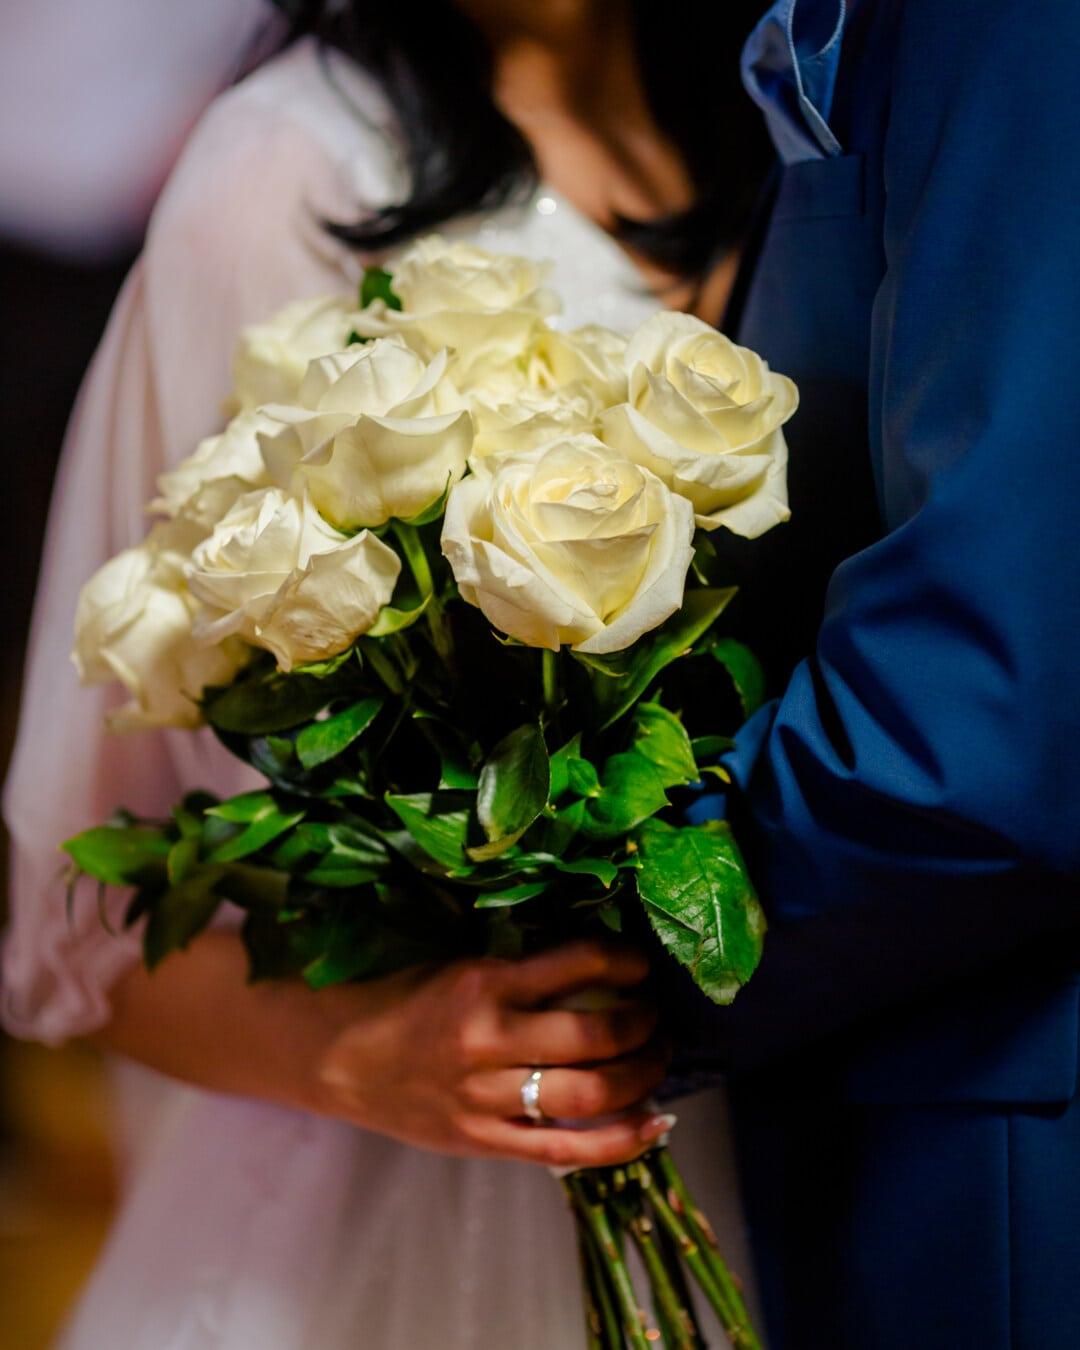 bouquet, white flower, roses, gift, boyfriend, girlfriend, date, love date, romantic, bride